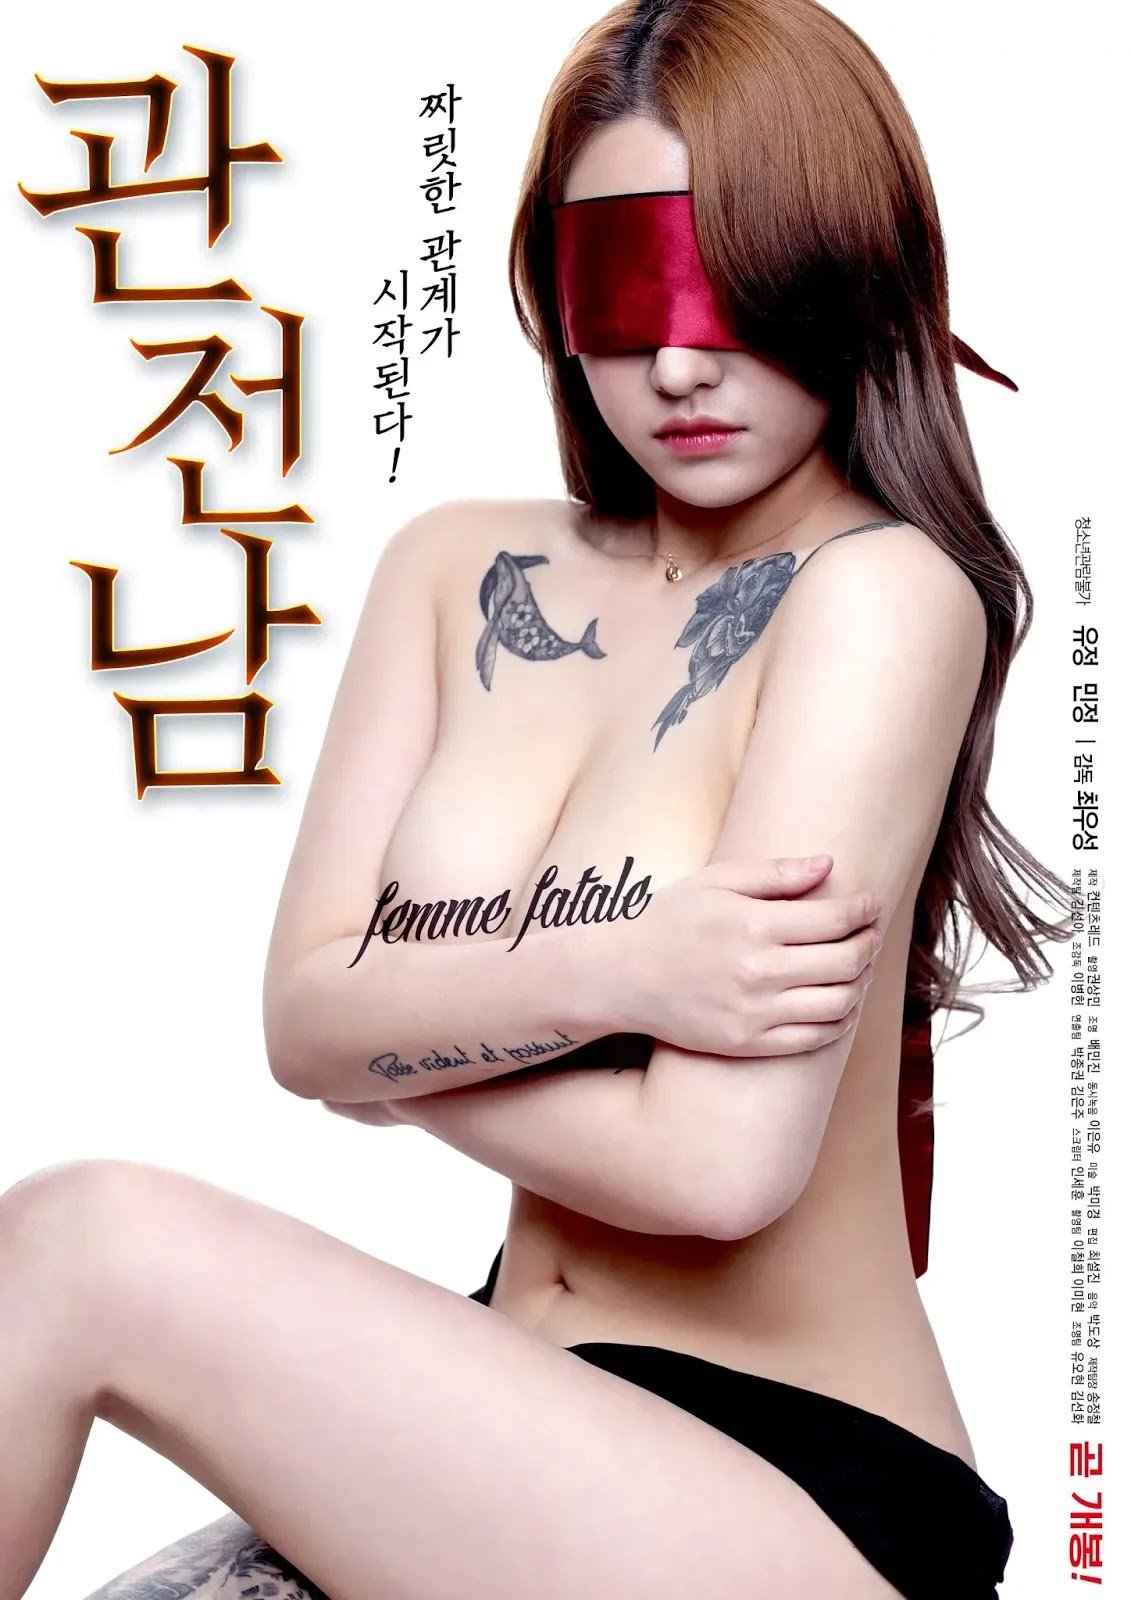 Observation Man Full Korea 18+ Adult Movie Online Free